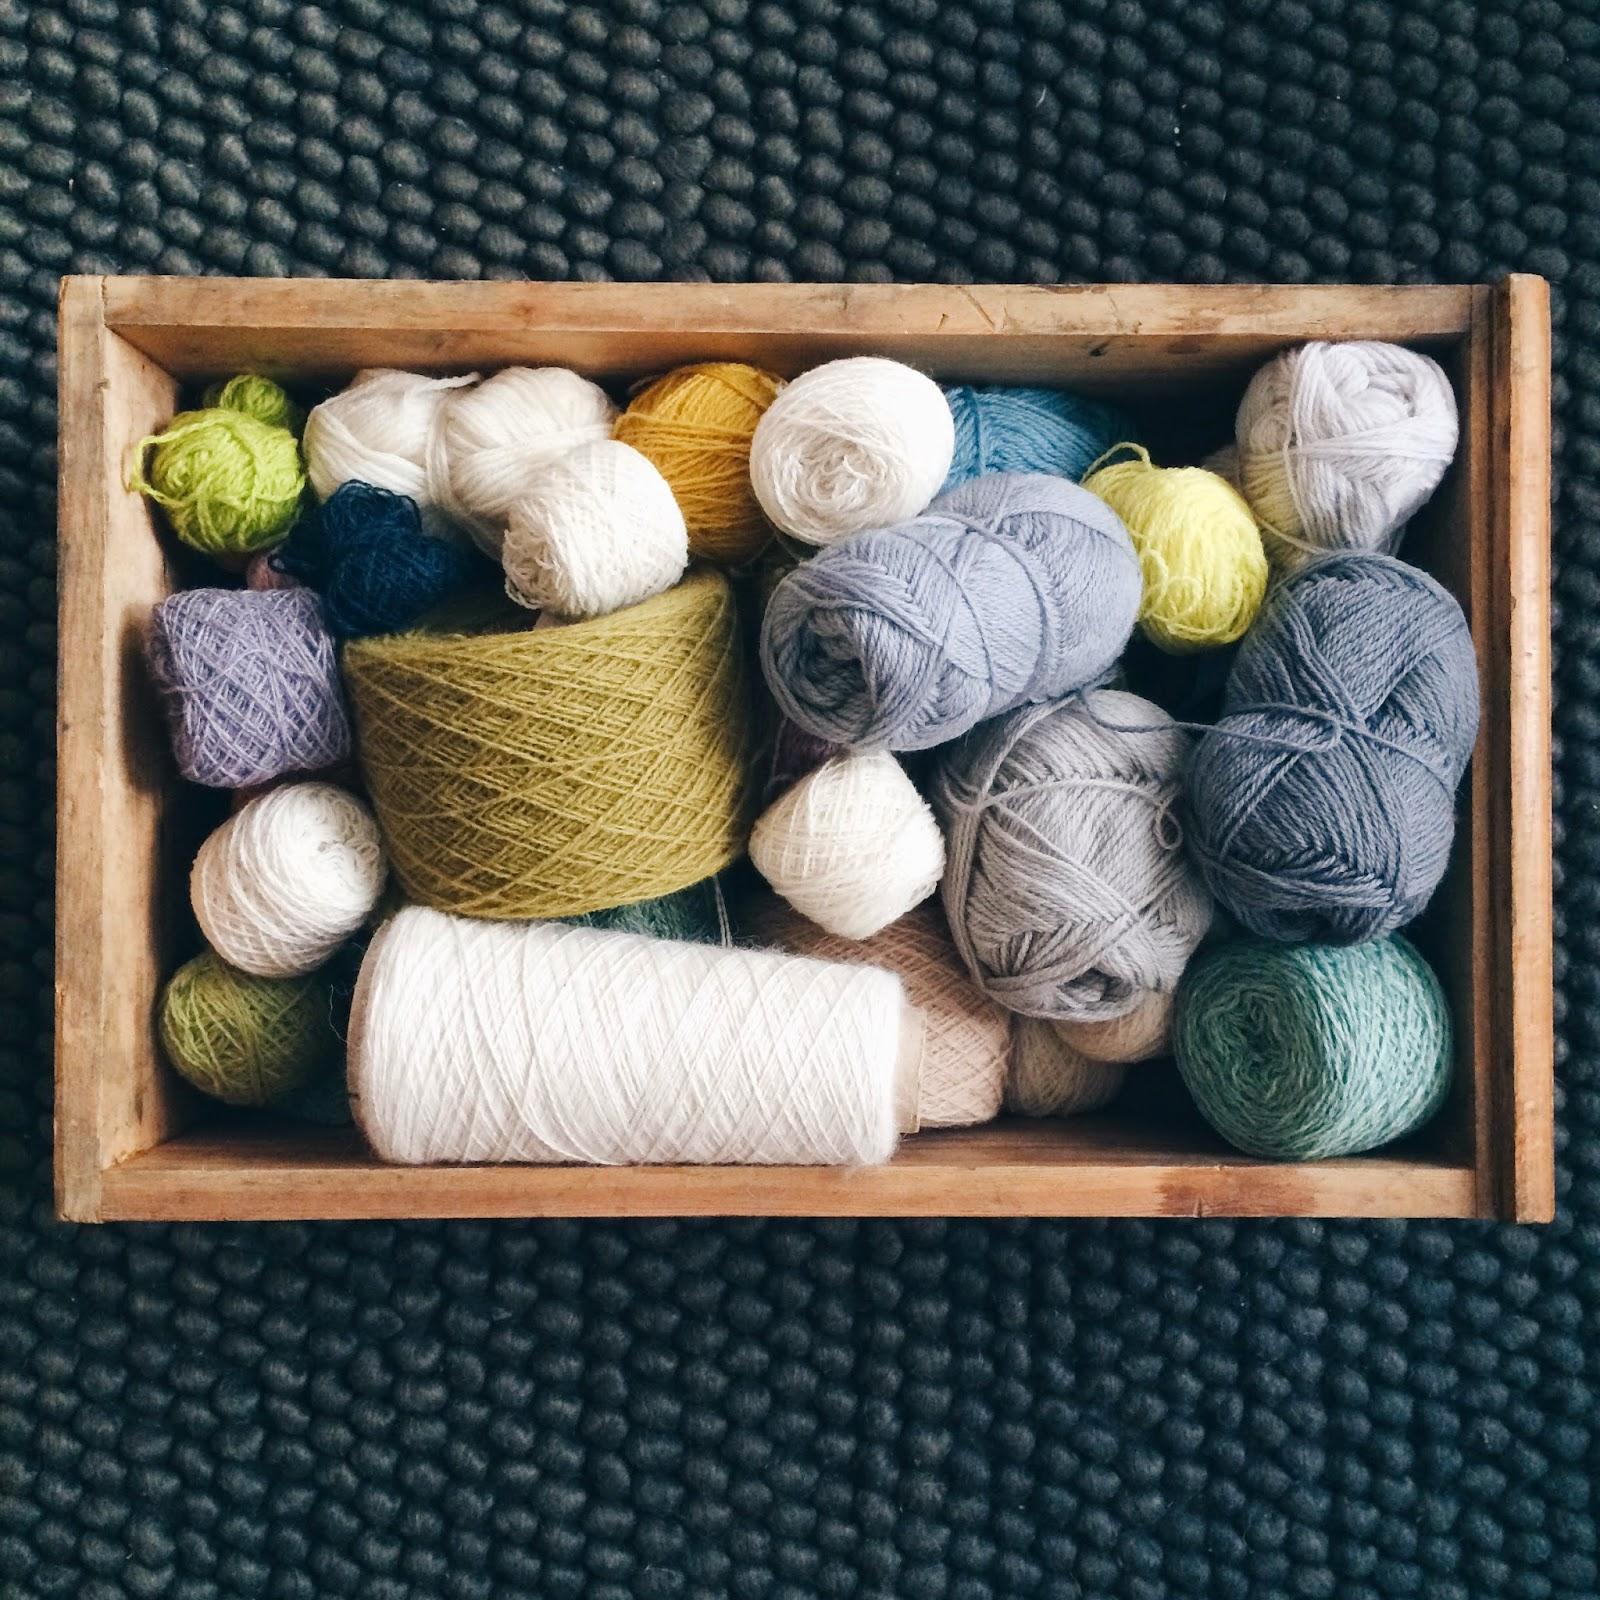 Oh, how I love yarn. Meraki